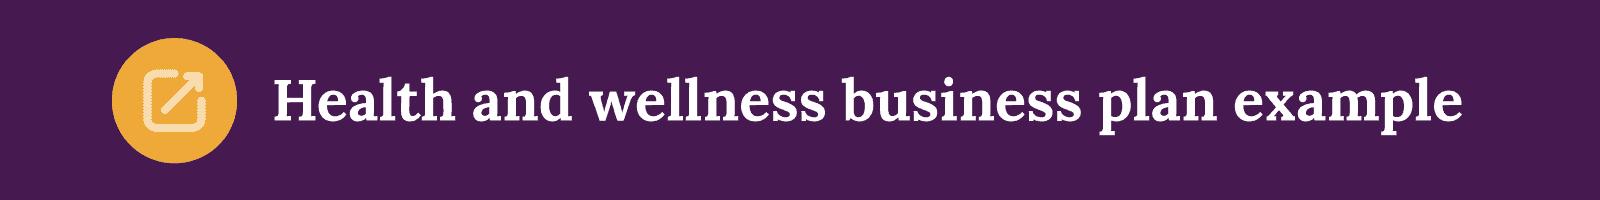 Health and wellness business plan template button